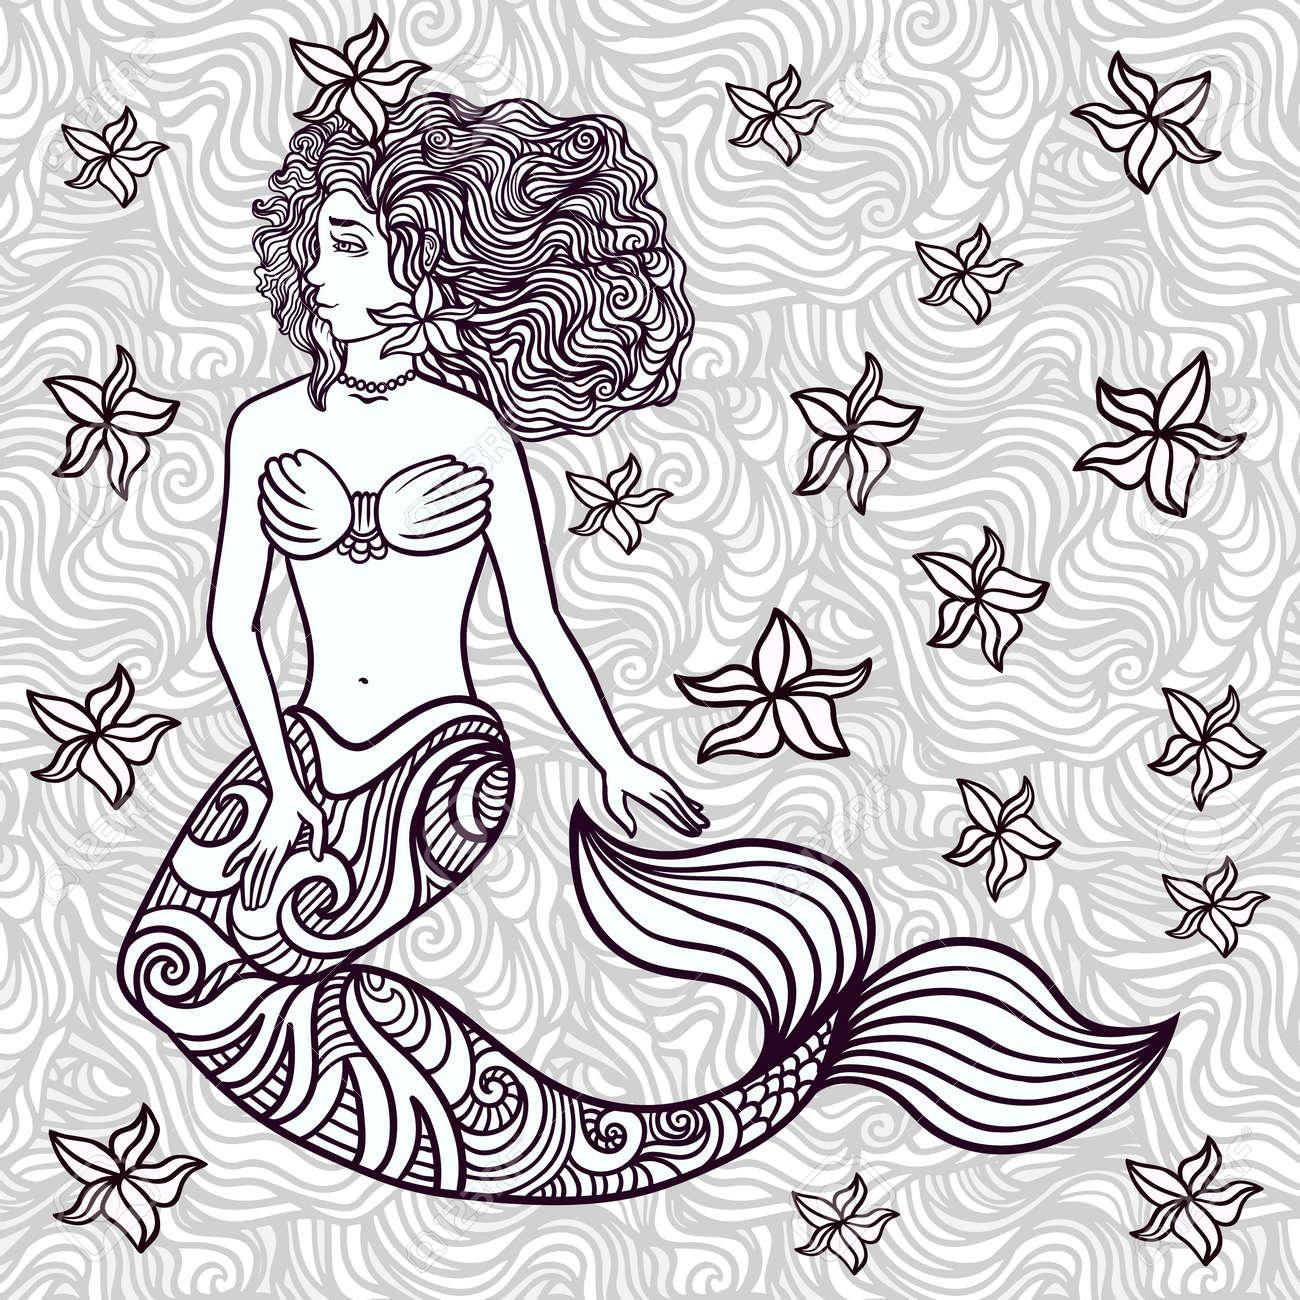 Hand drawn beautiful artwork mermaid with curly hair, algae, barnacles. - 63444088